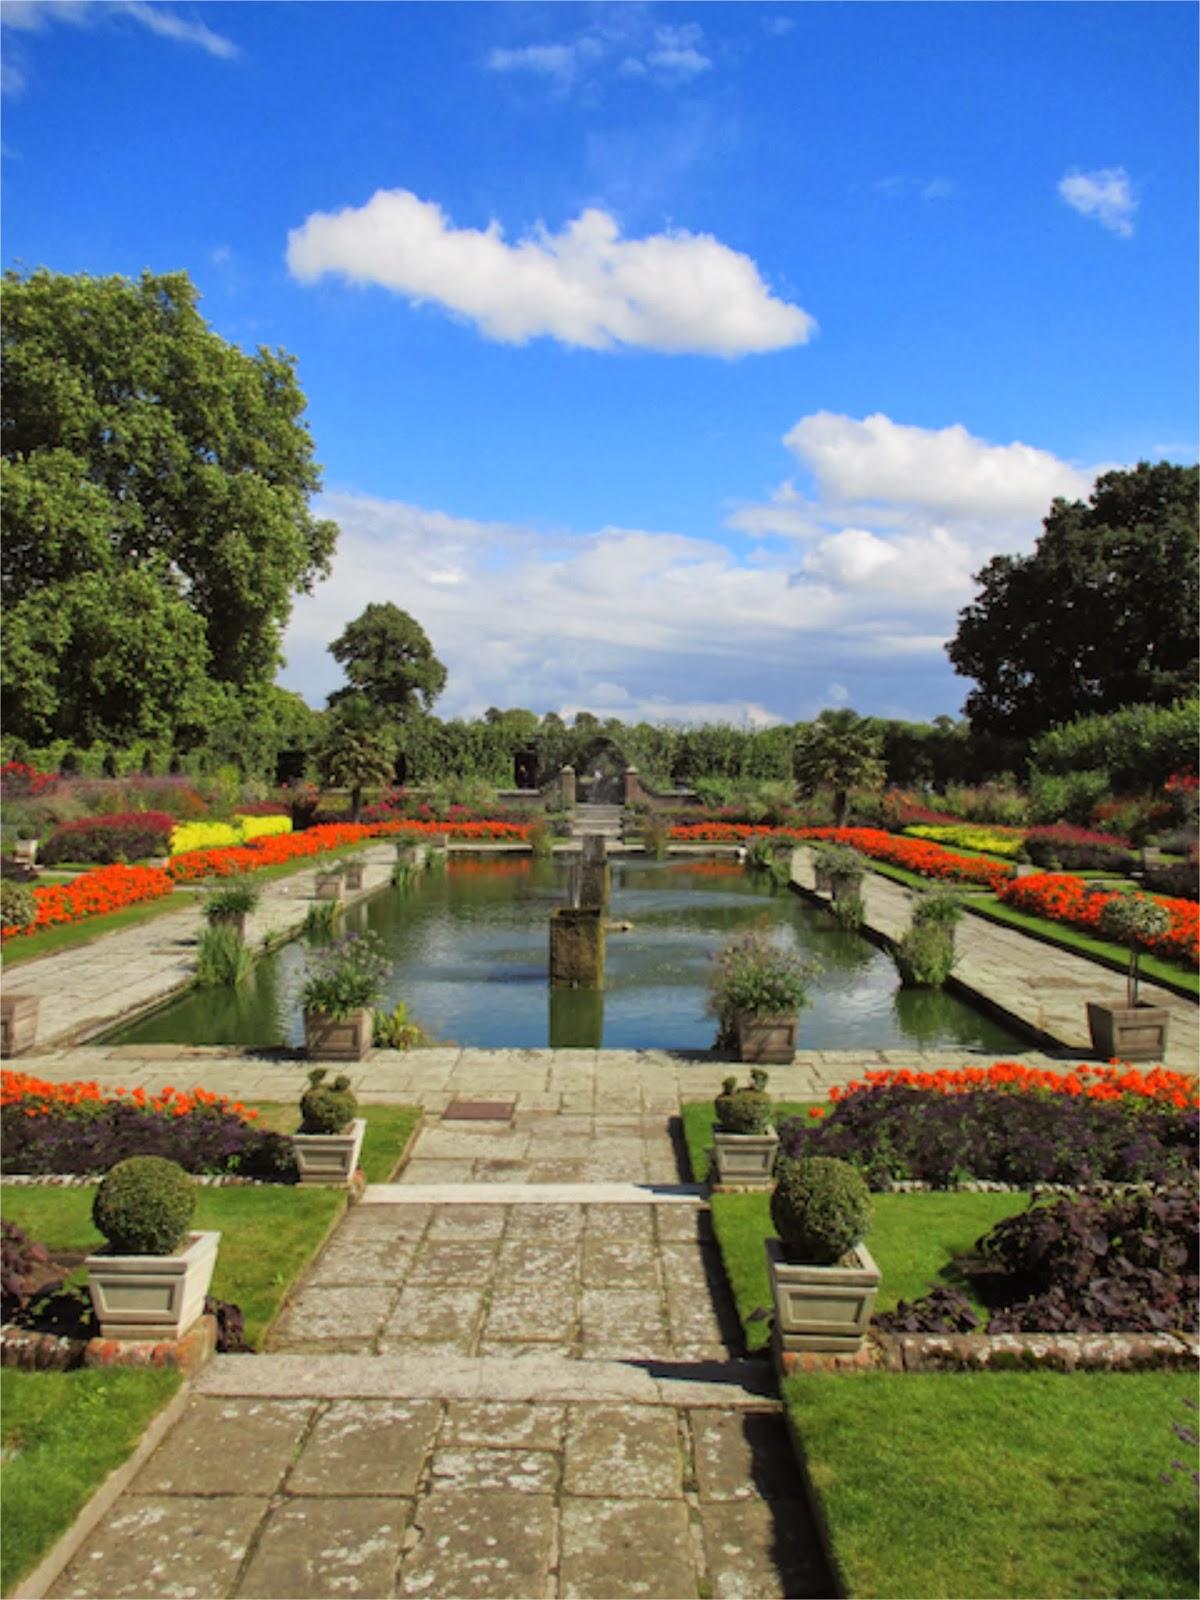 Kensington palace gardens for Kensington park